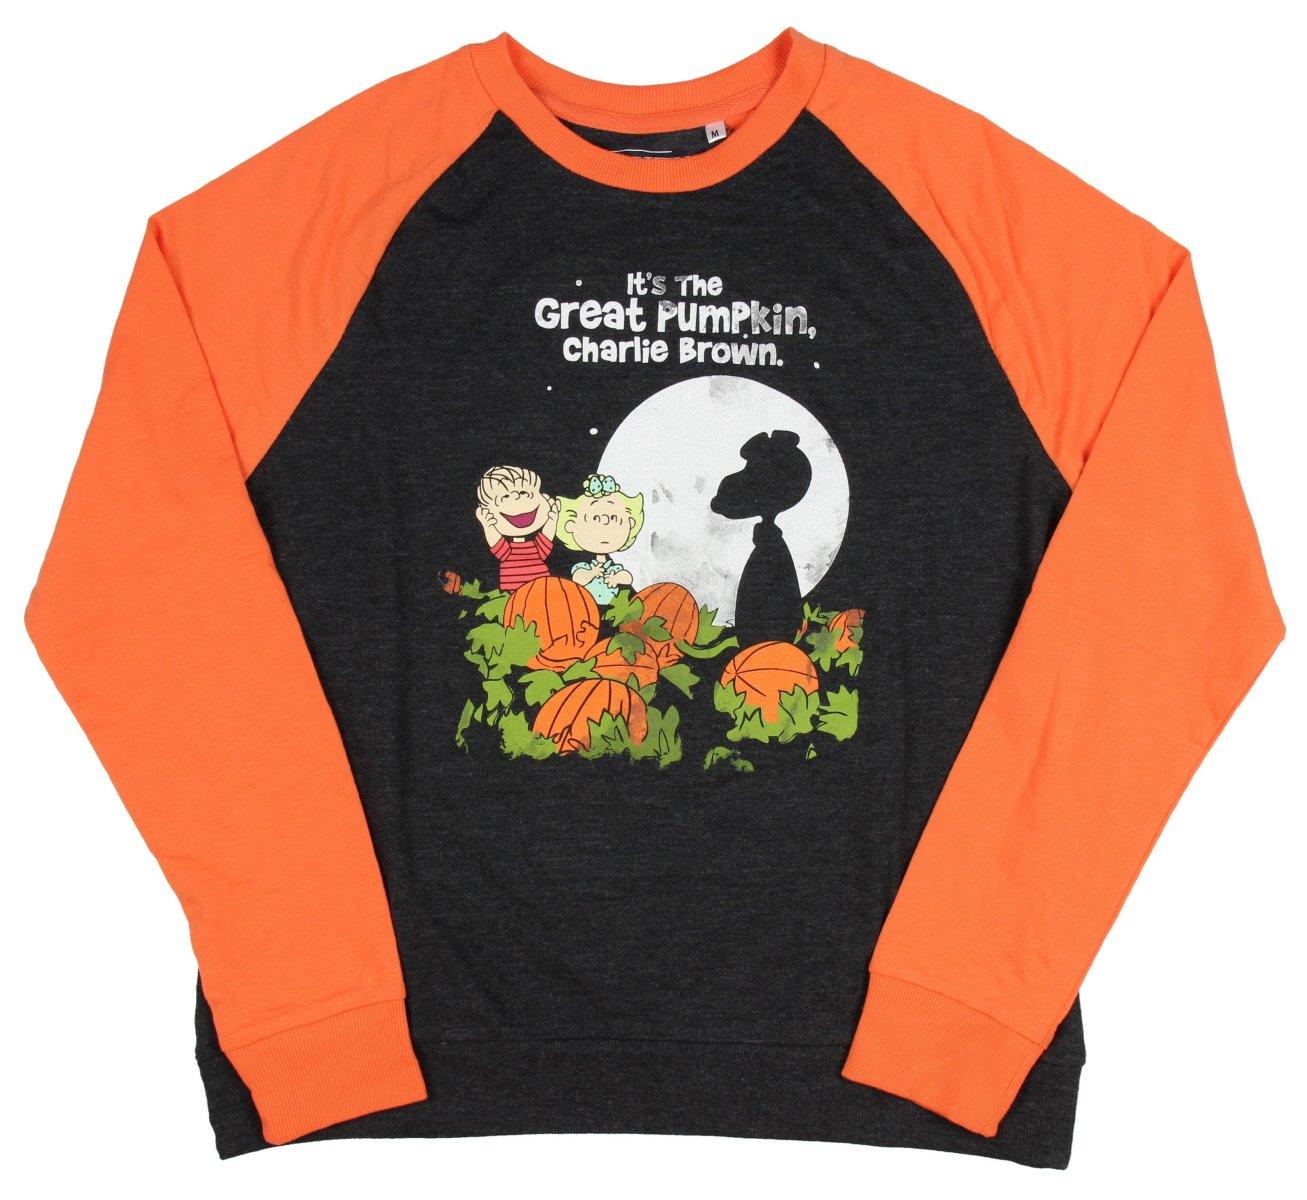 Peanuts Juniors It's The Great Pumpkin, Charlie Brown Raglan Pullover Sweatshirt (XL)